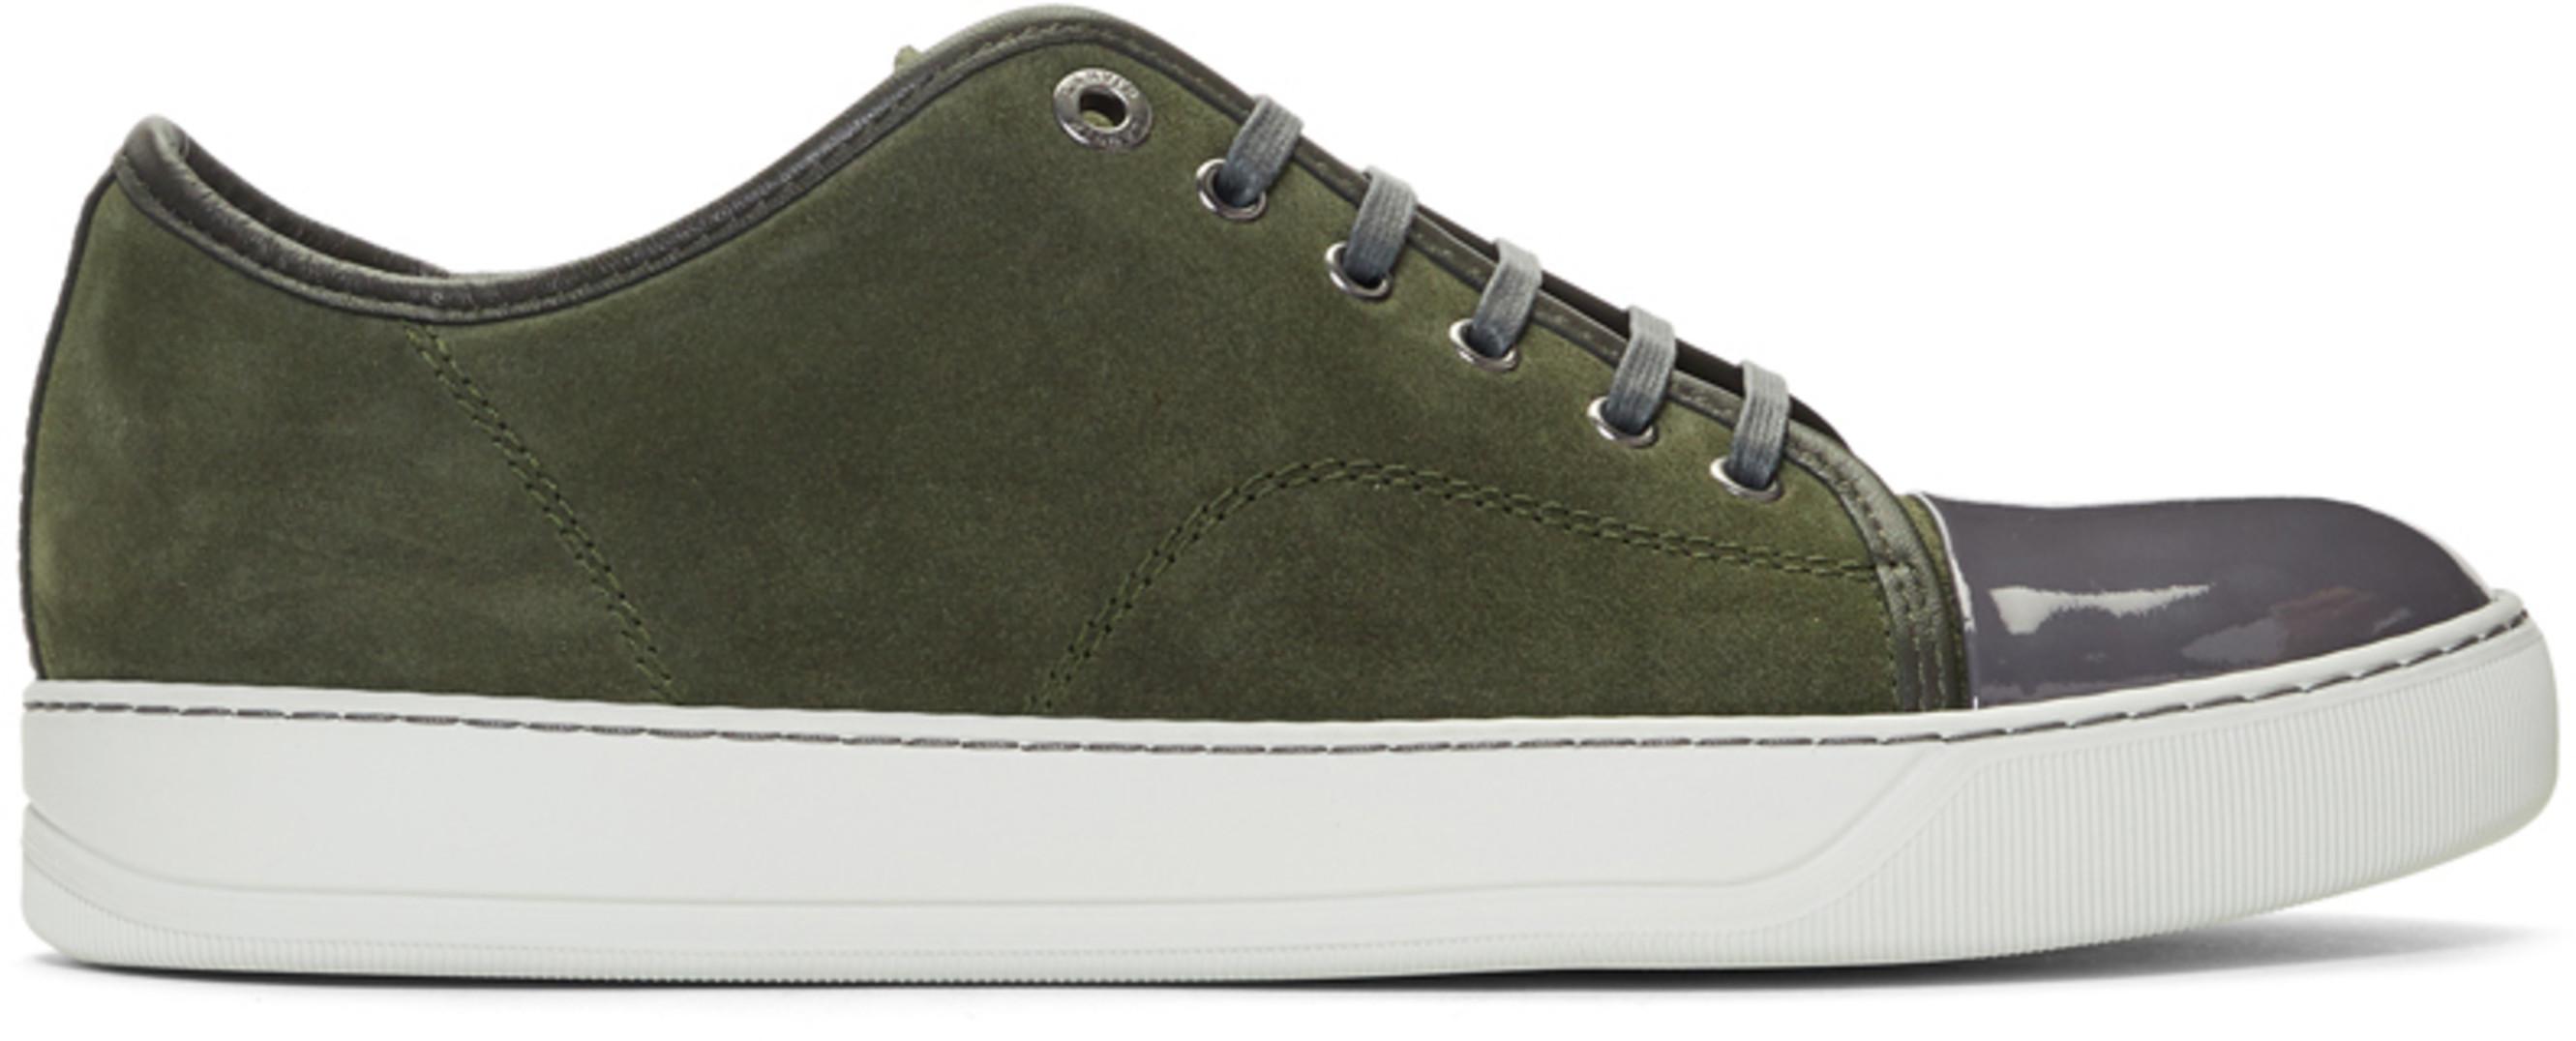 8ed32112810 Green Suede   Patent Cap Toe Sneakers